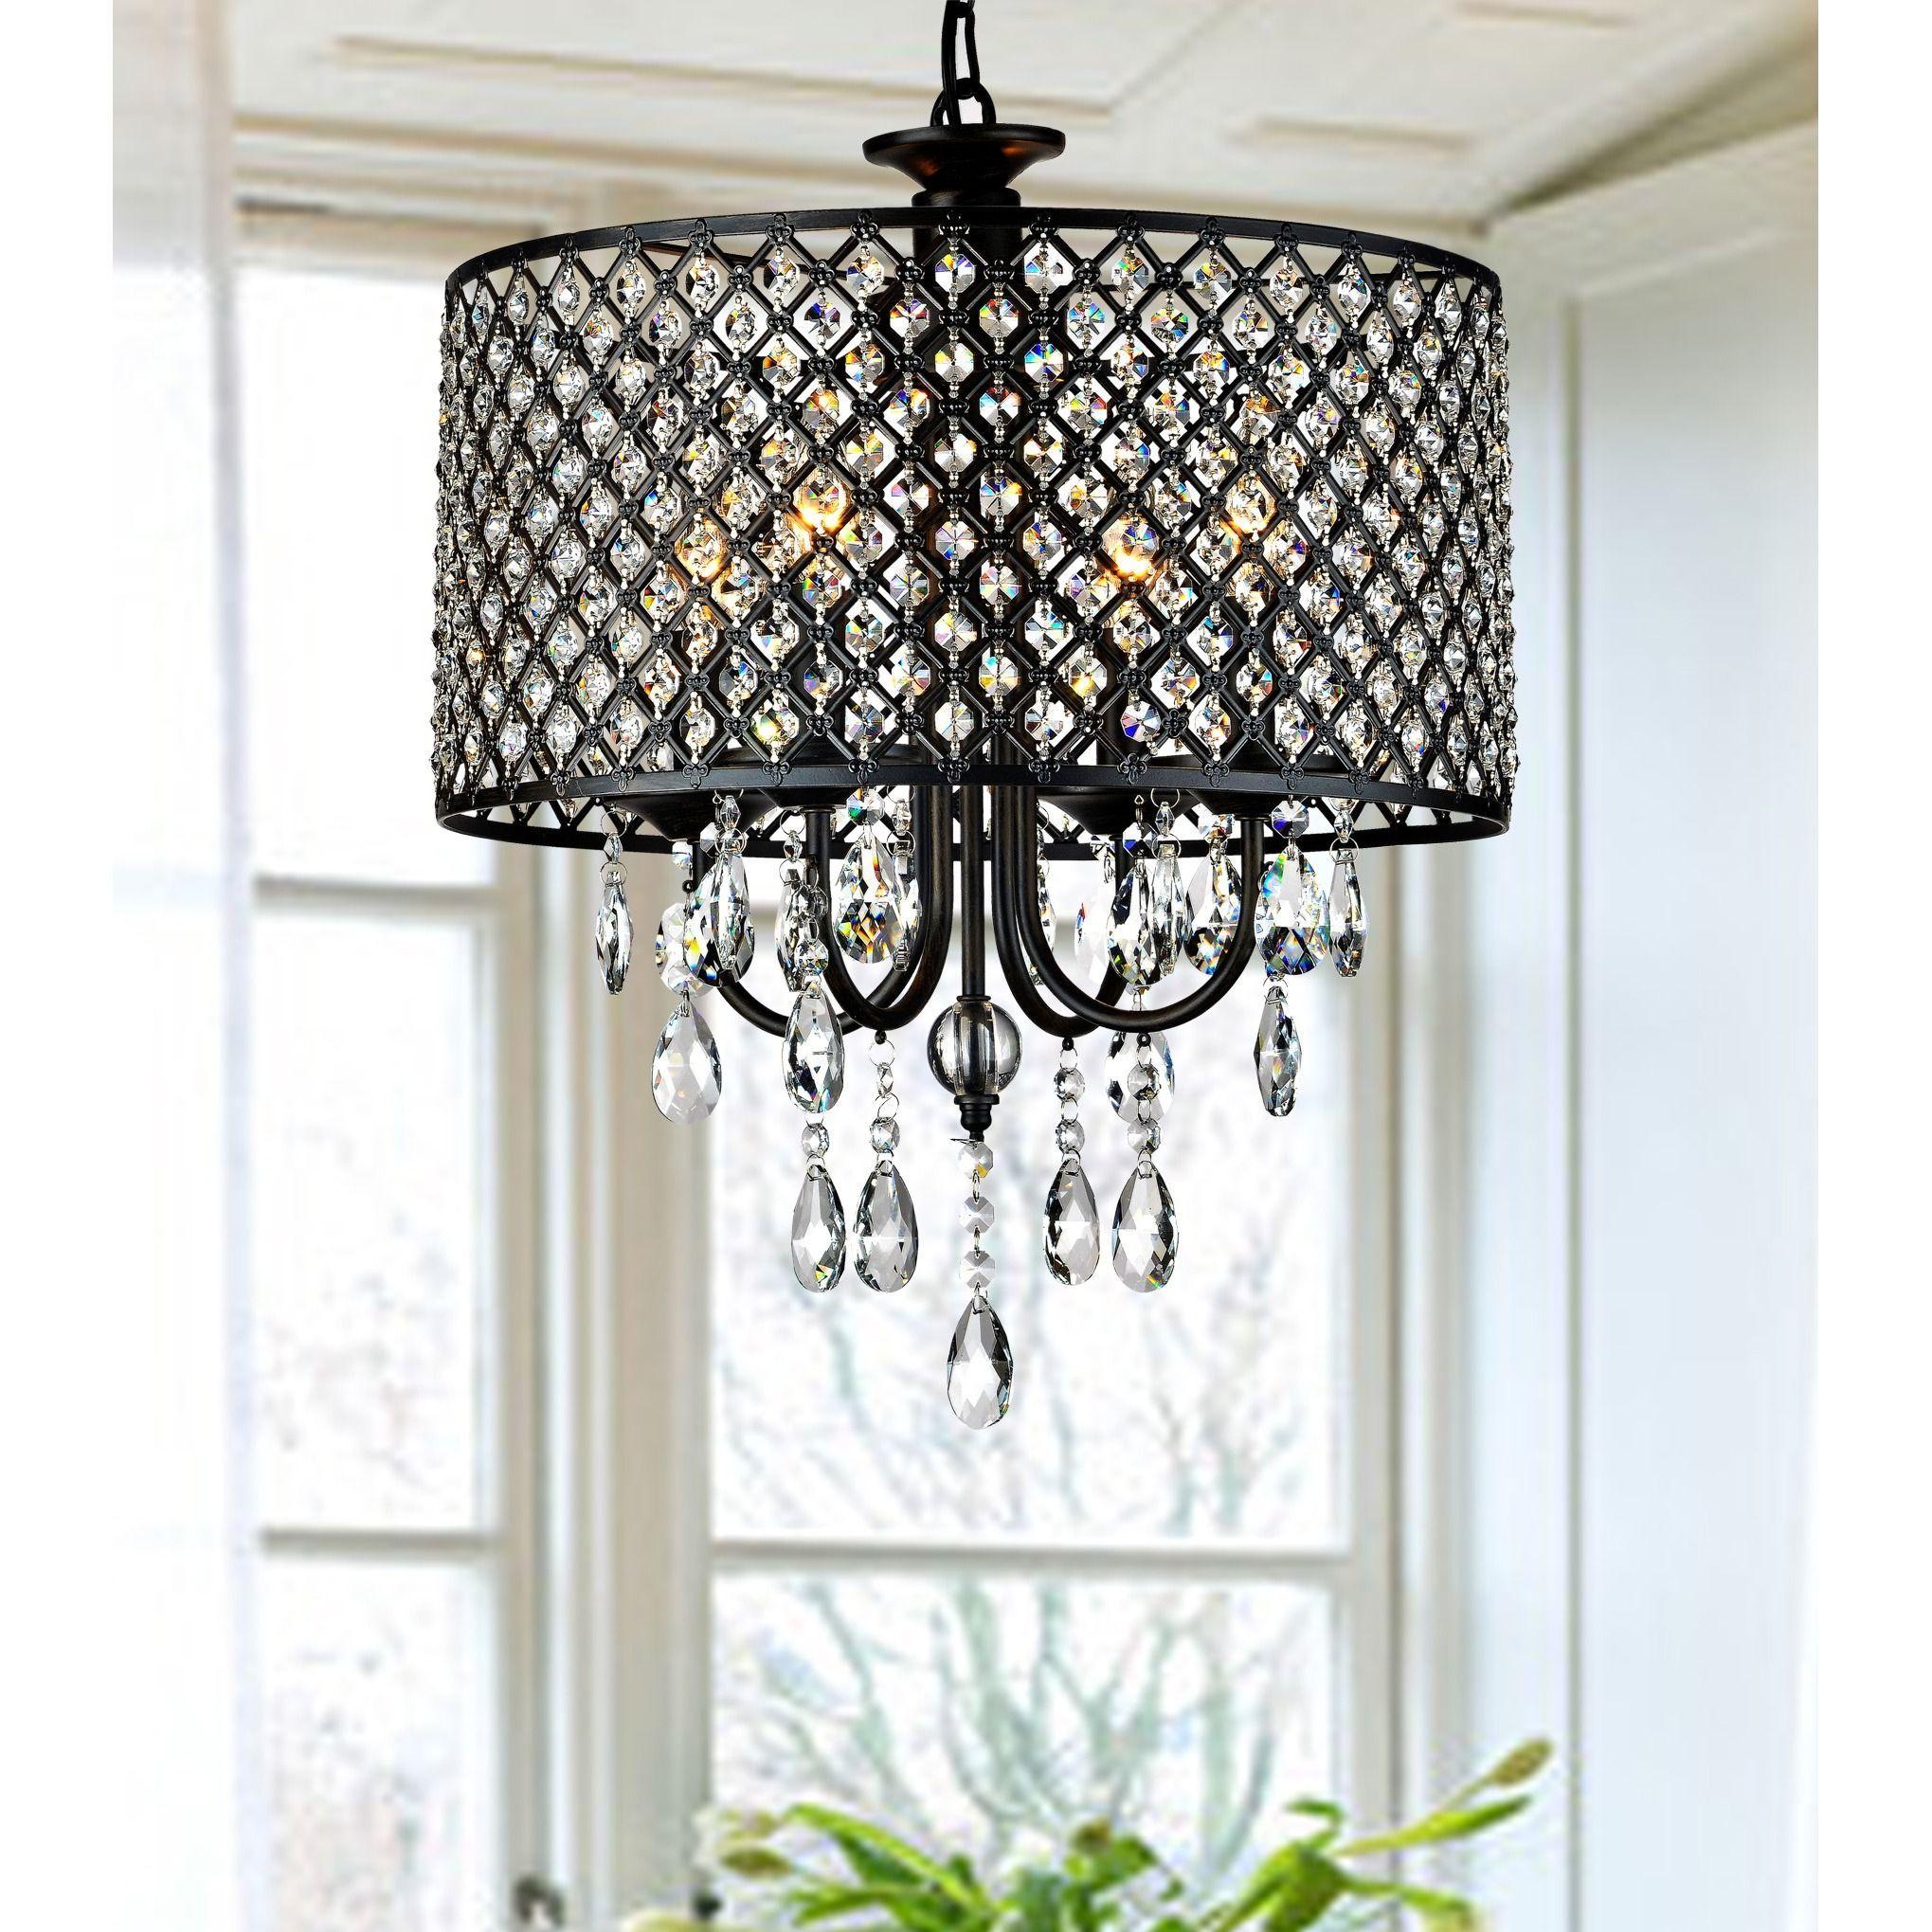 Porch & Den Cherrywood Merrie Lynn Antique Black 4 Light Inside Aurore 4 Light Crystal Chandeliers (View 13 of 30)